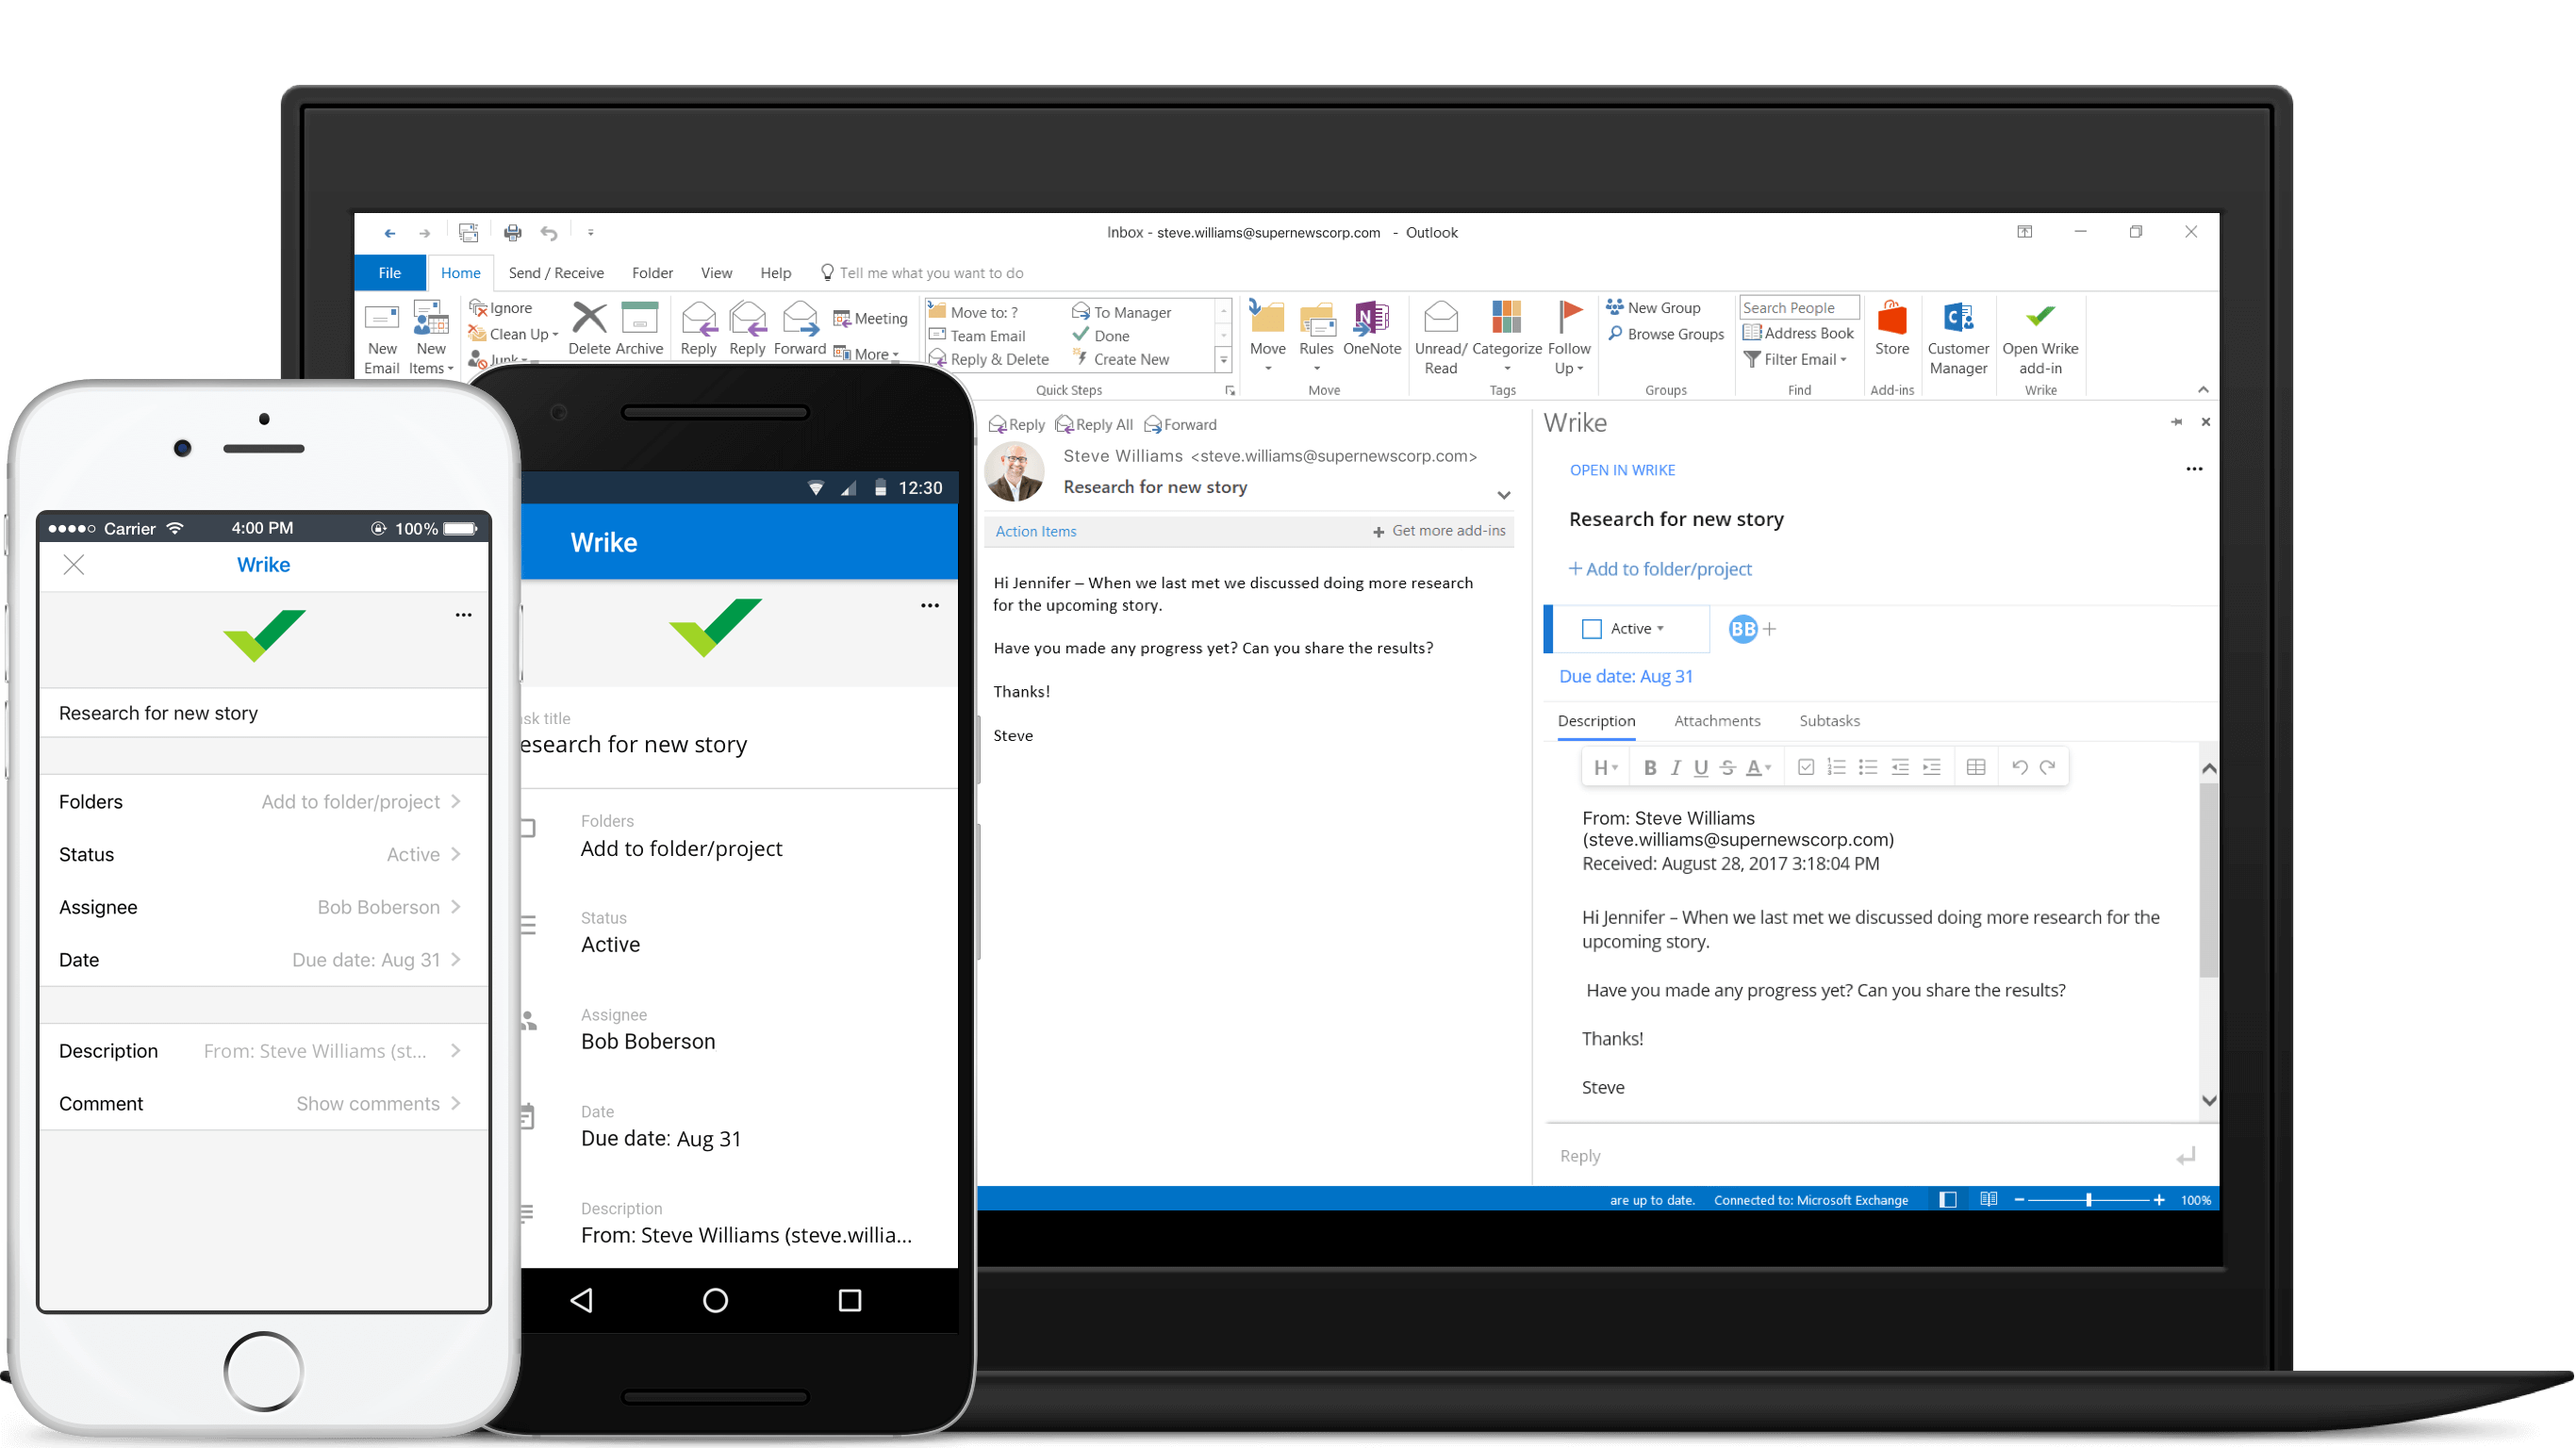 Wrike for Outlook